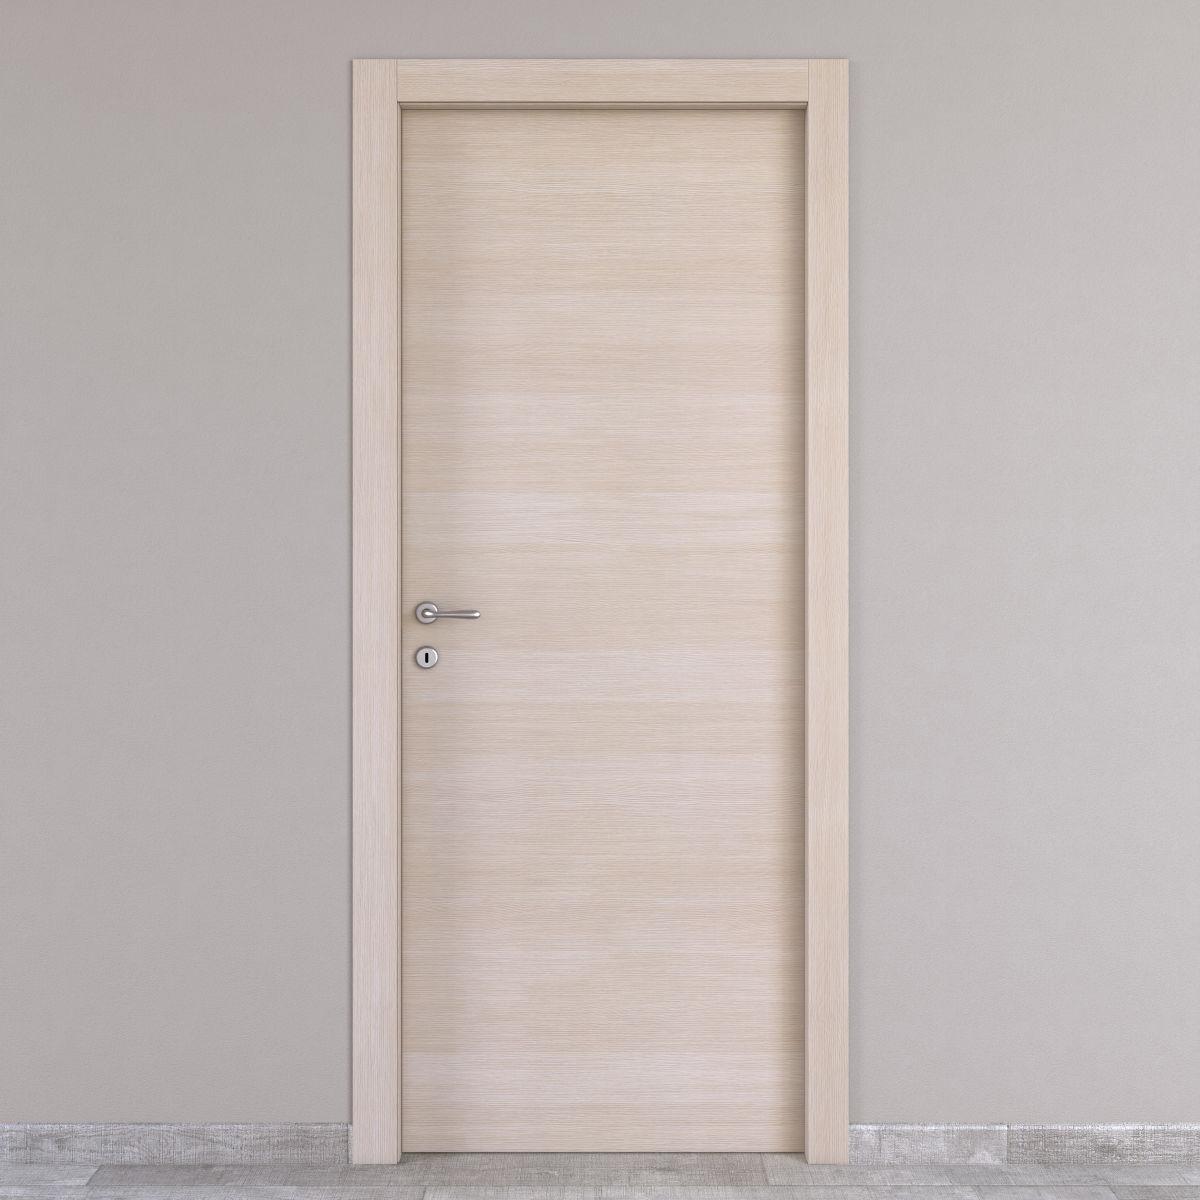 Porta a soffietto leroy merlin best porte interieure for Leroy merlin porta di roma